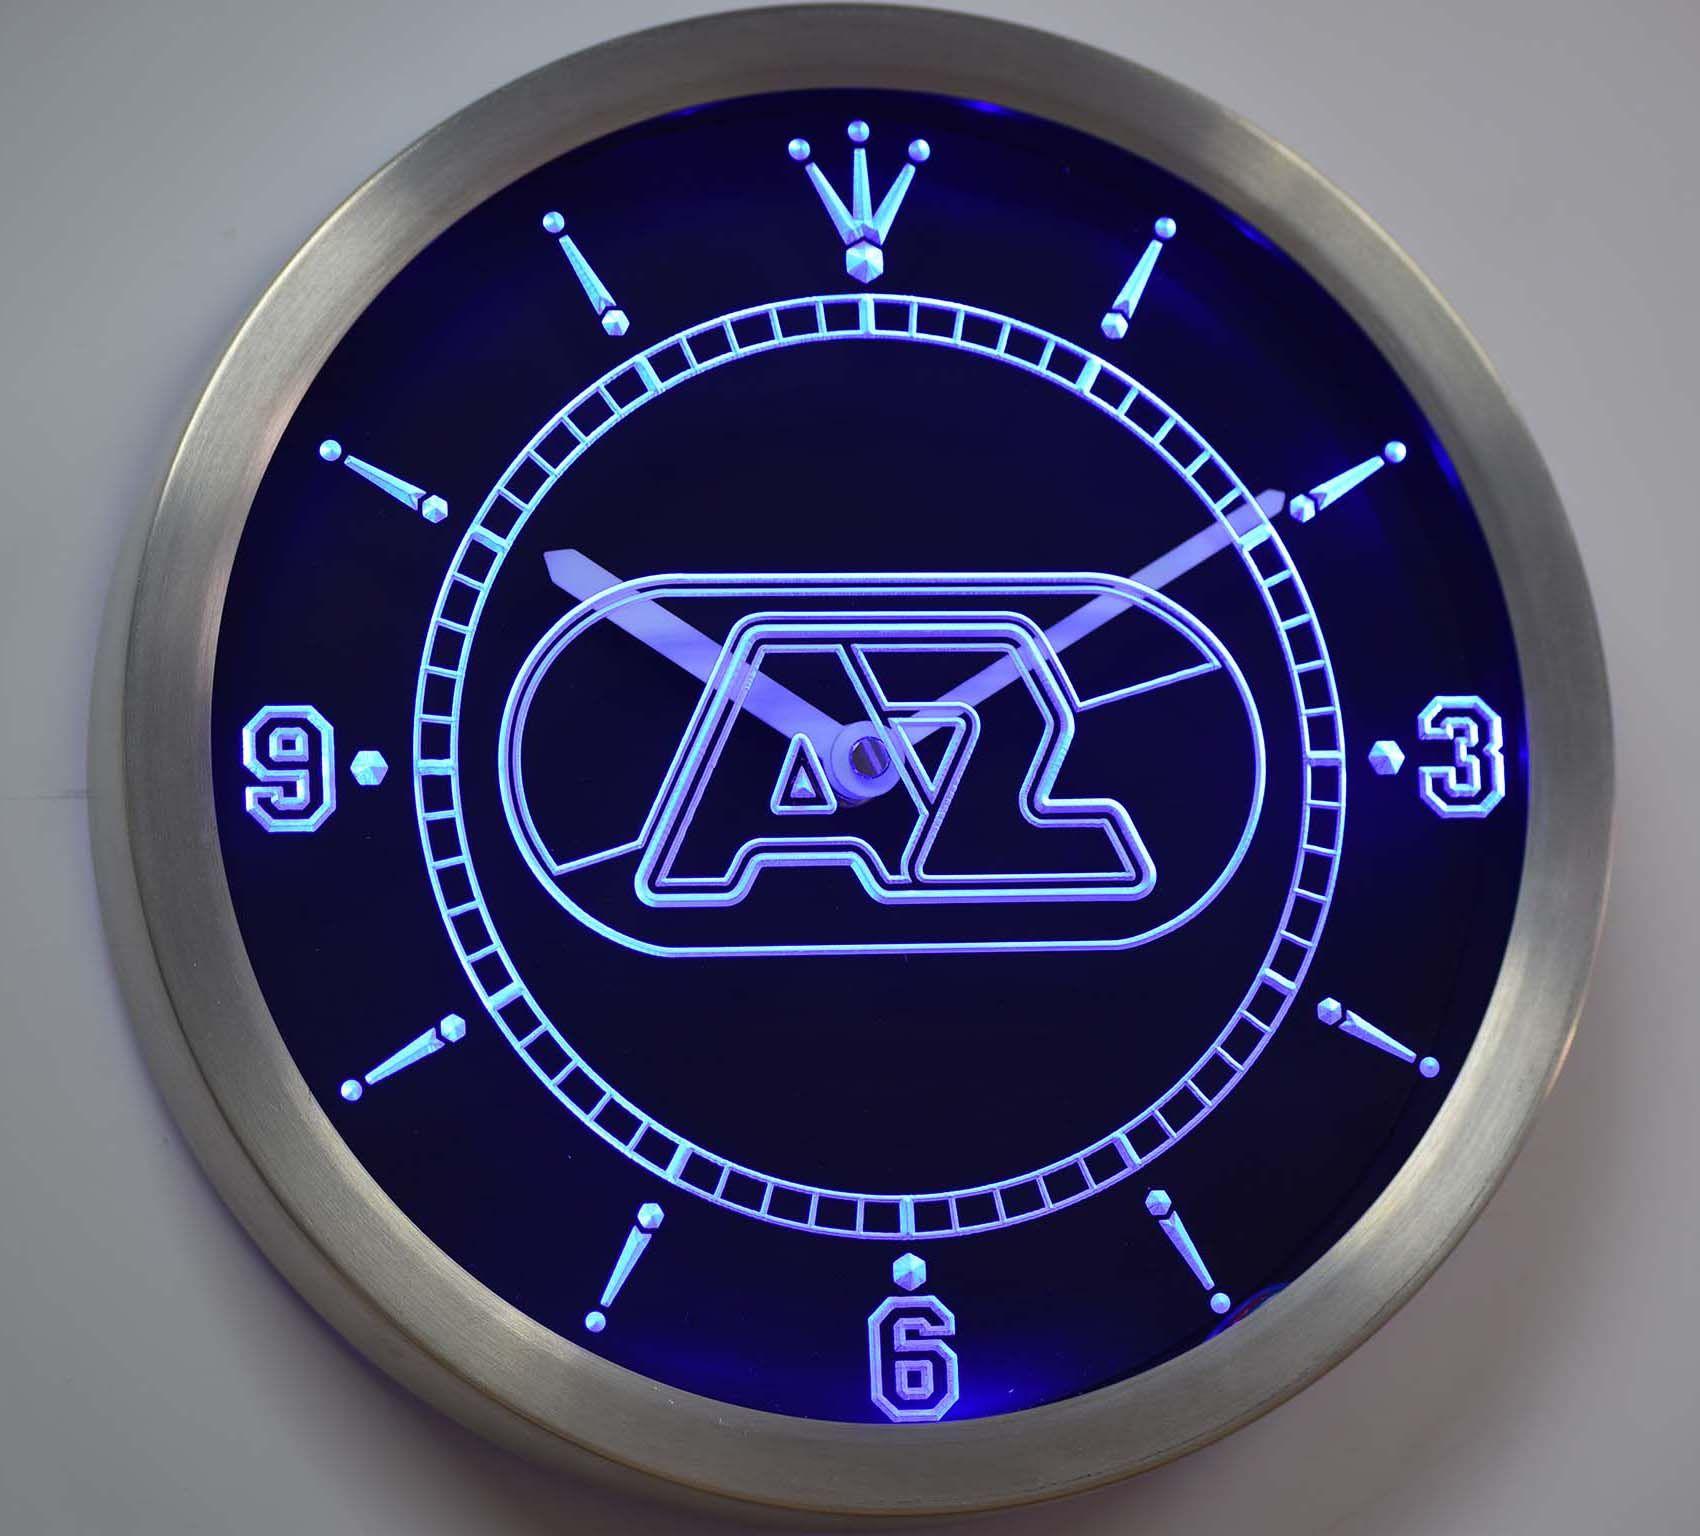 nc1013 الكمار الدوري الهولندي Zaanstreek ضوء النيون علامات ساعة الحائط LED